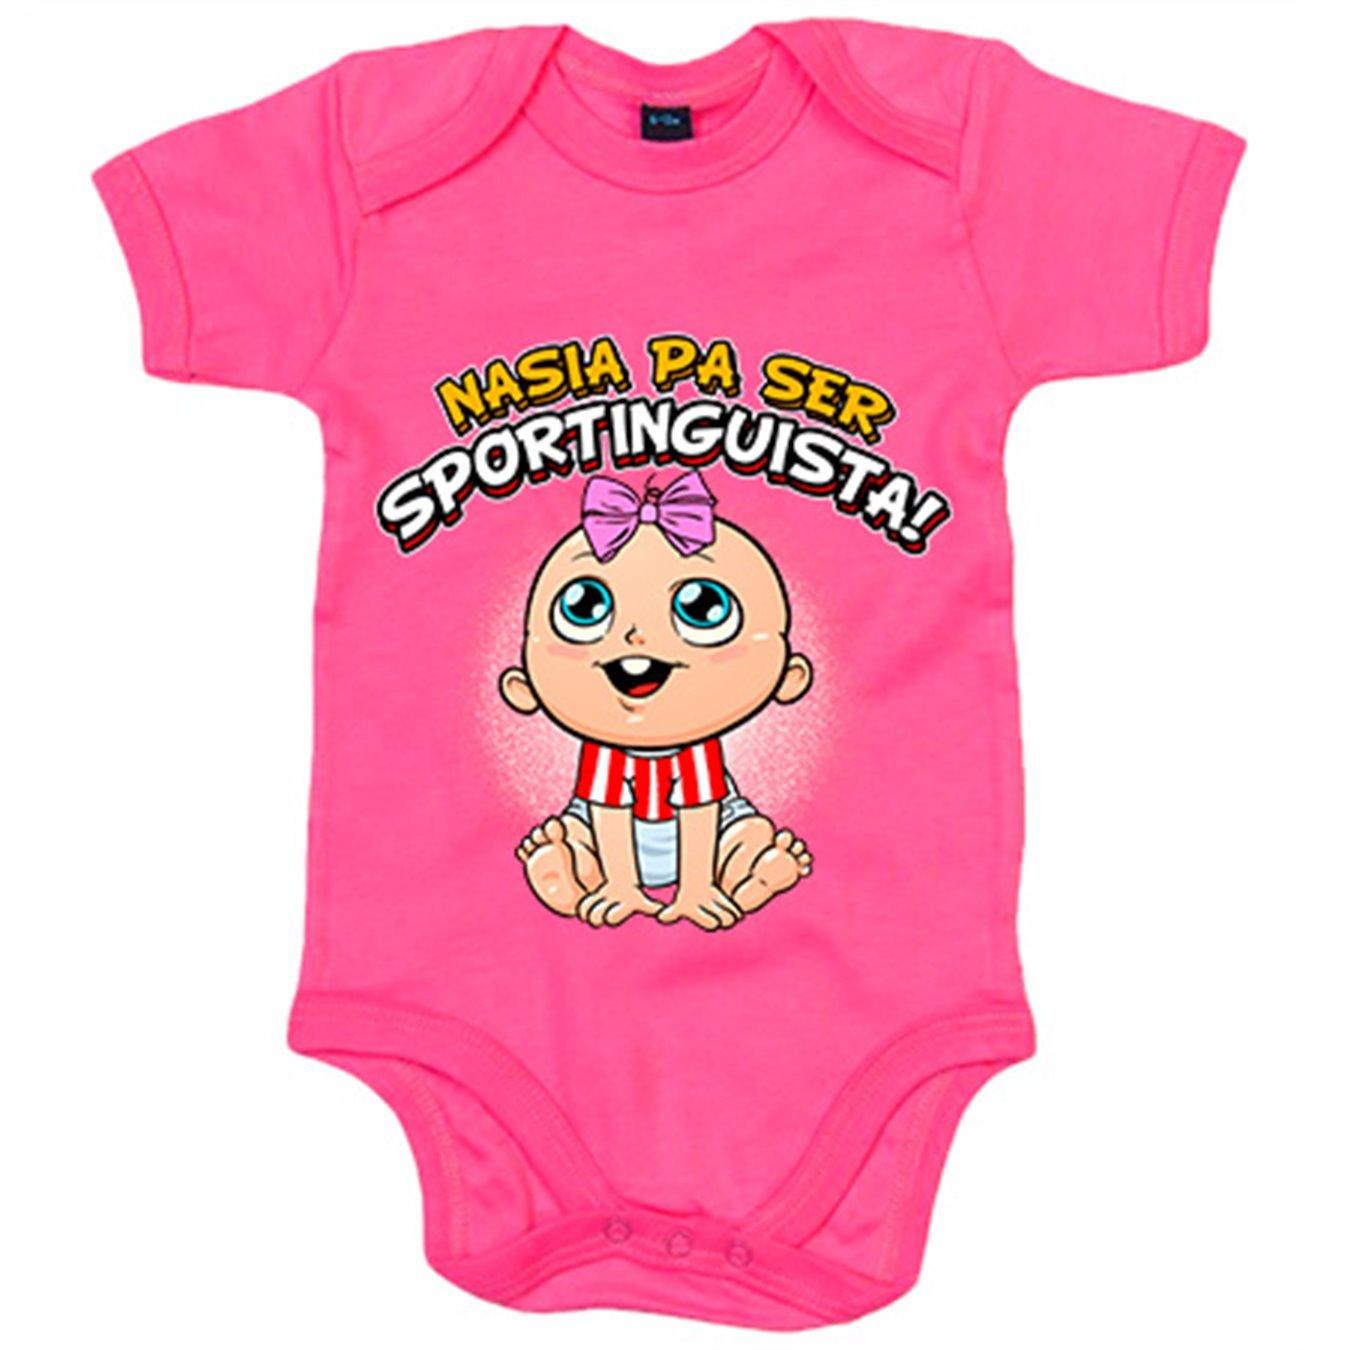 Body bebé nacida para ser Sportinguista Sporting Gijón fútbol - Amarillo, 6-12 meses: Amazon.es: Bebé